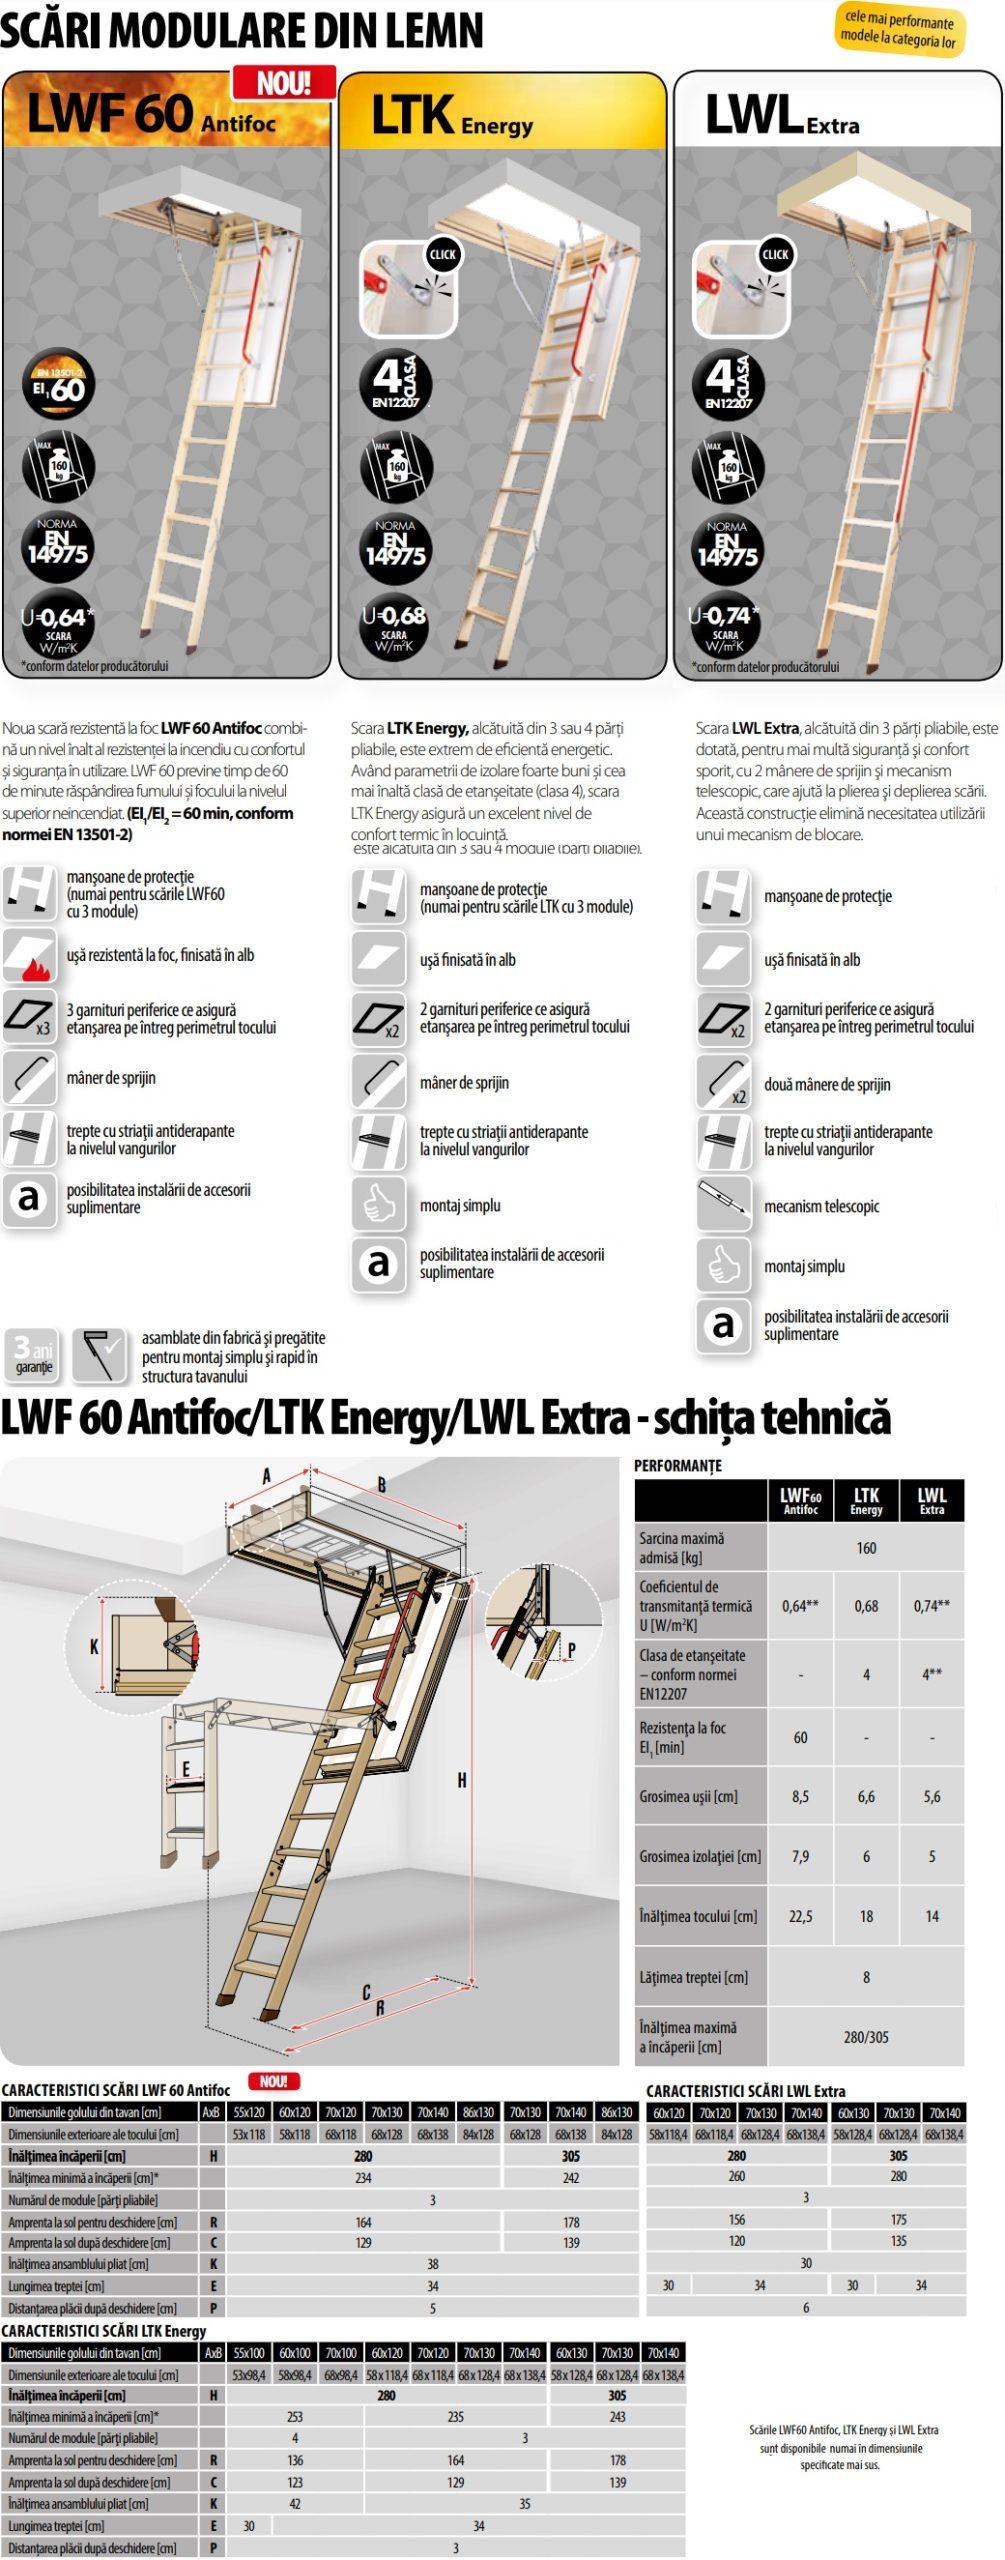 scari pod LWF 60 Antifoc-LTK Energy-LWL Extra